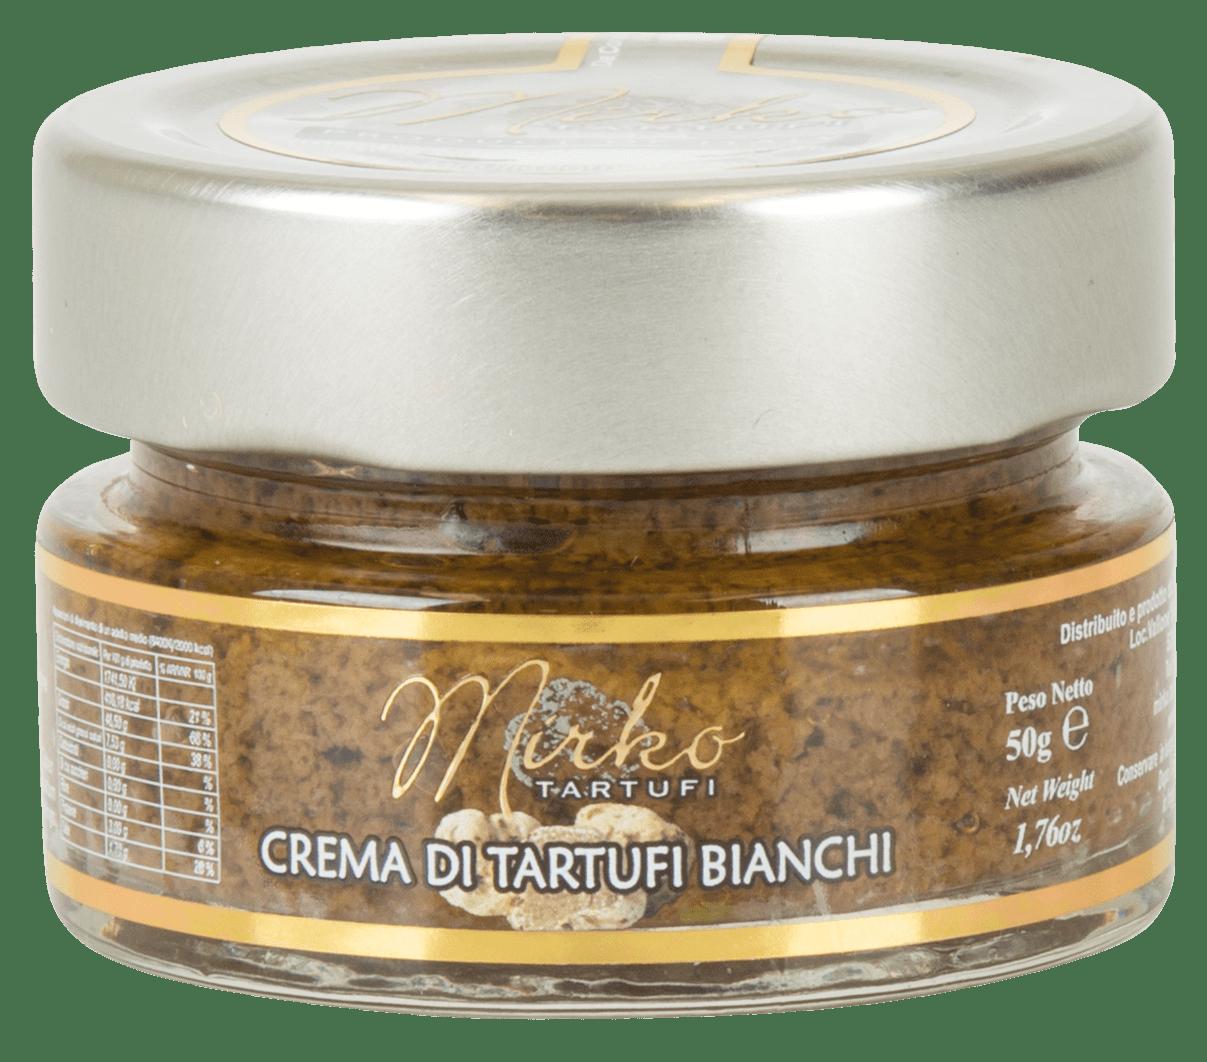 Crema di Tartufi Bianchi 50g